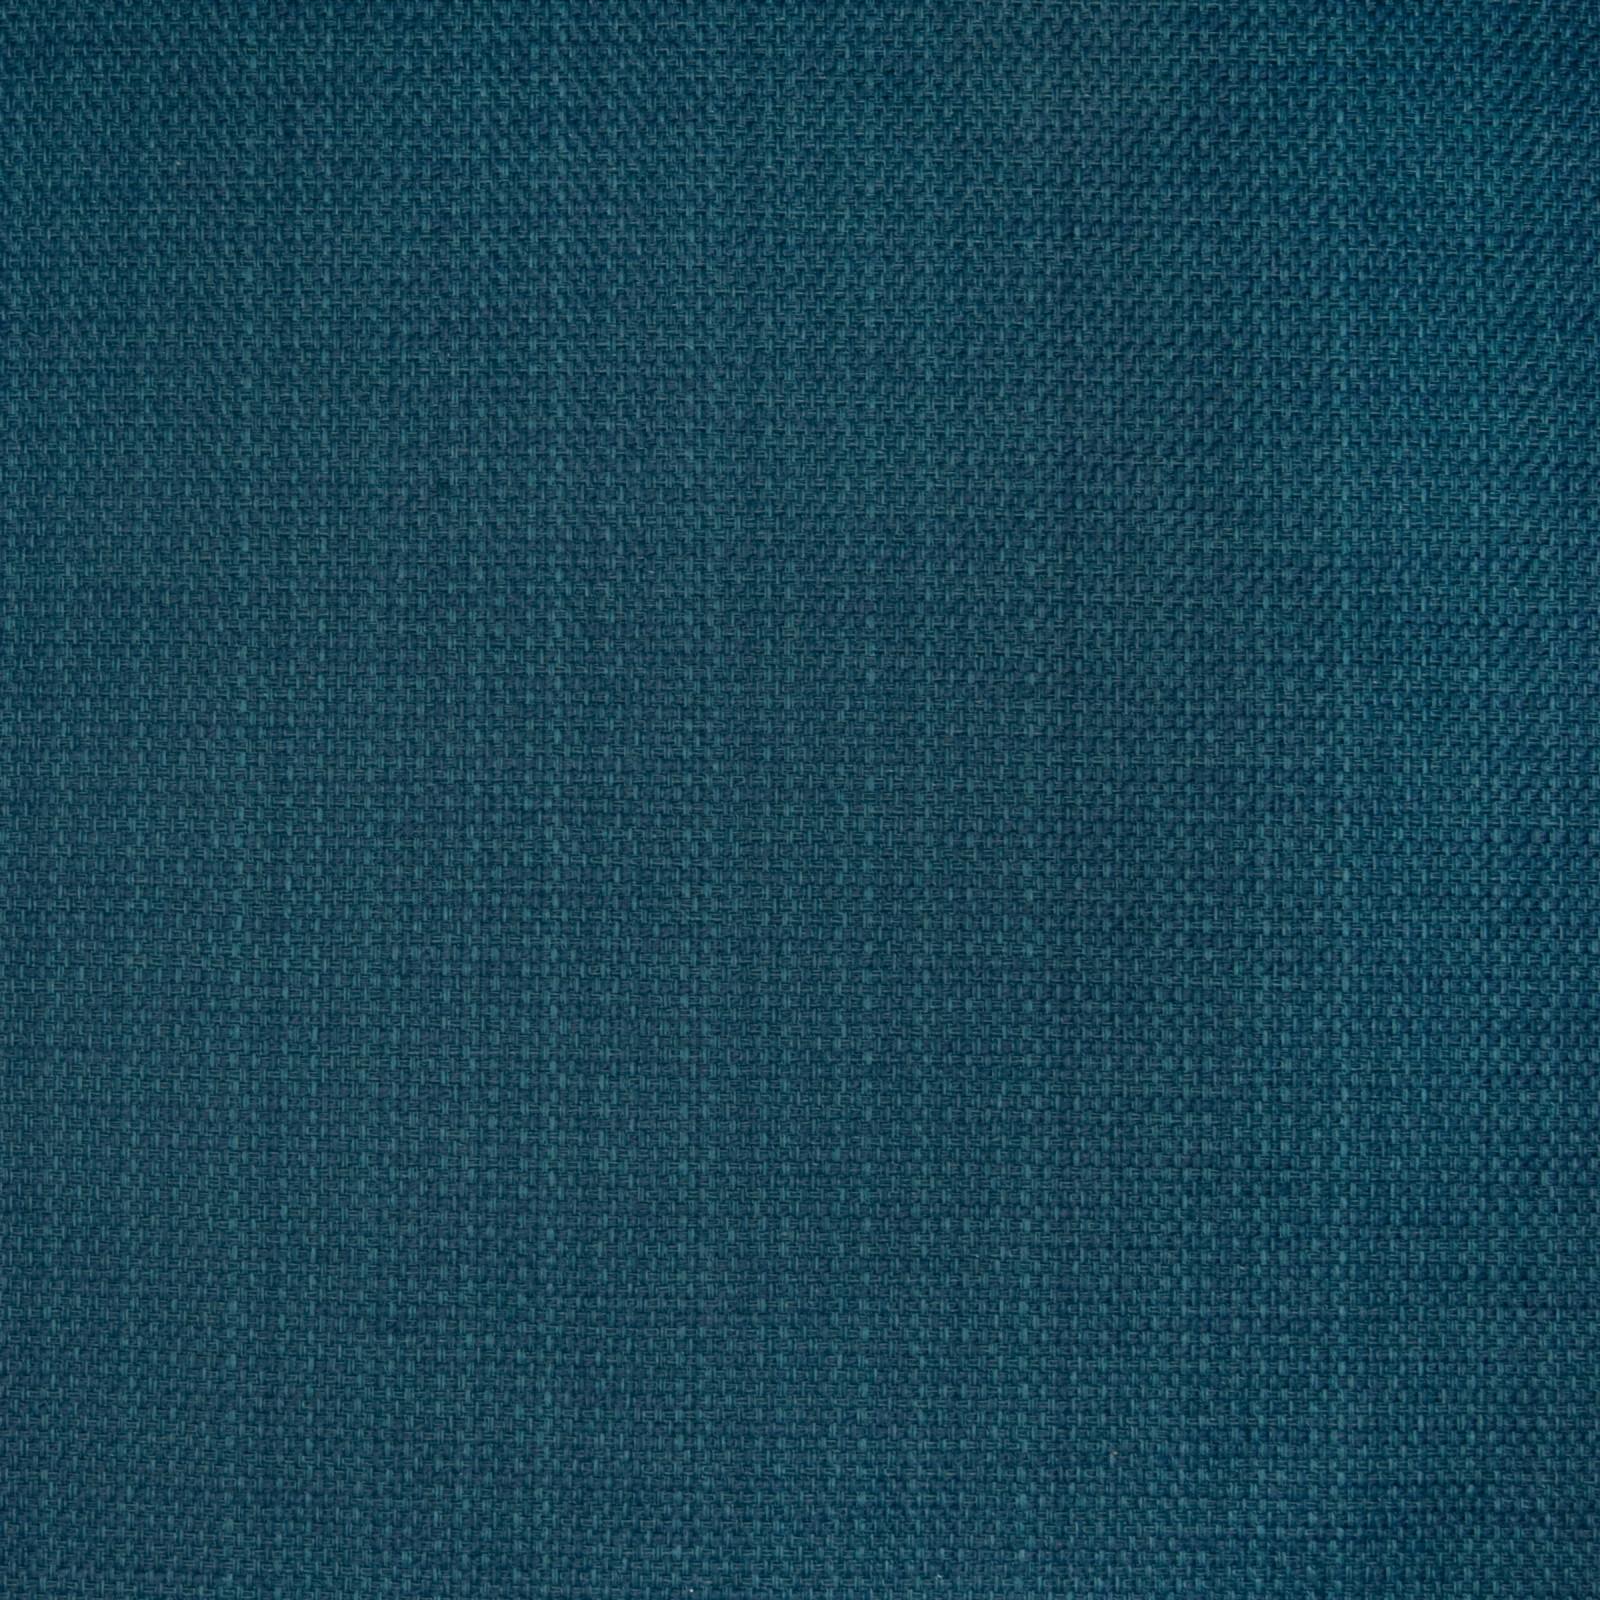 B1426 Deep Sea Greenhouse Fabrics